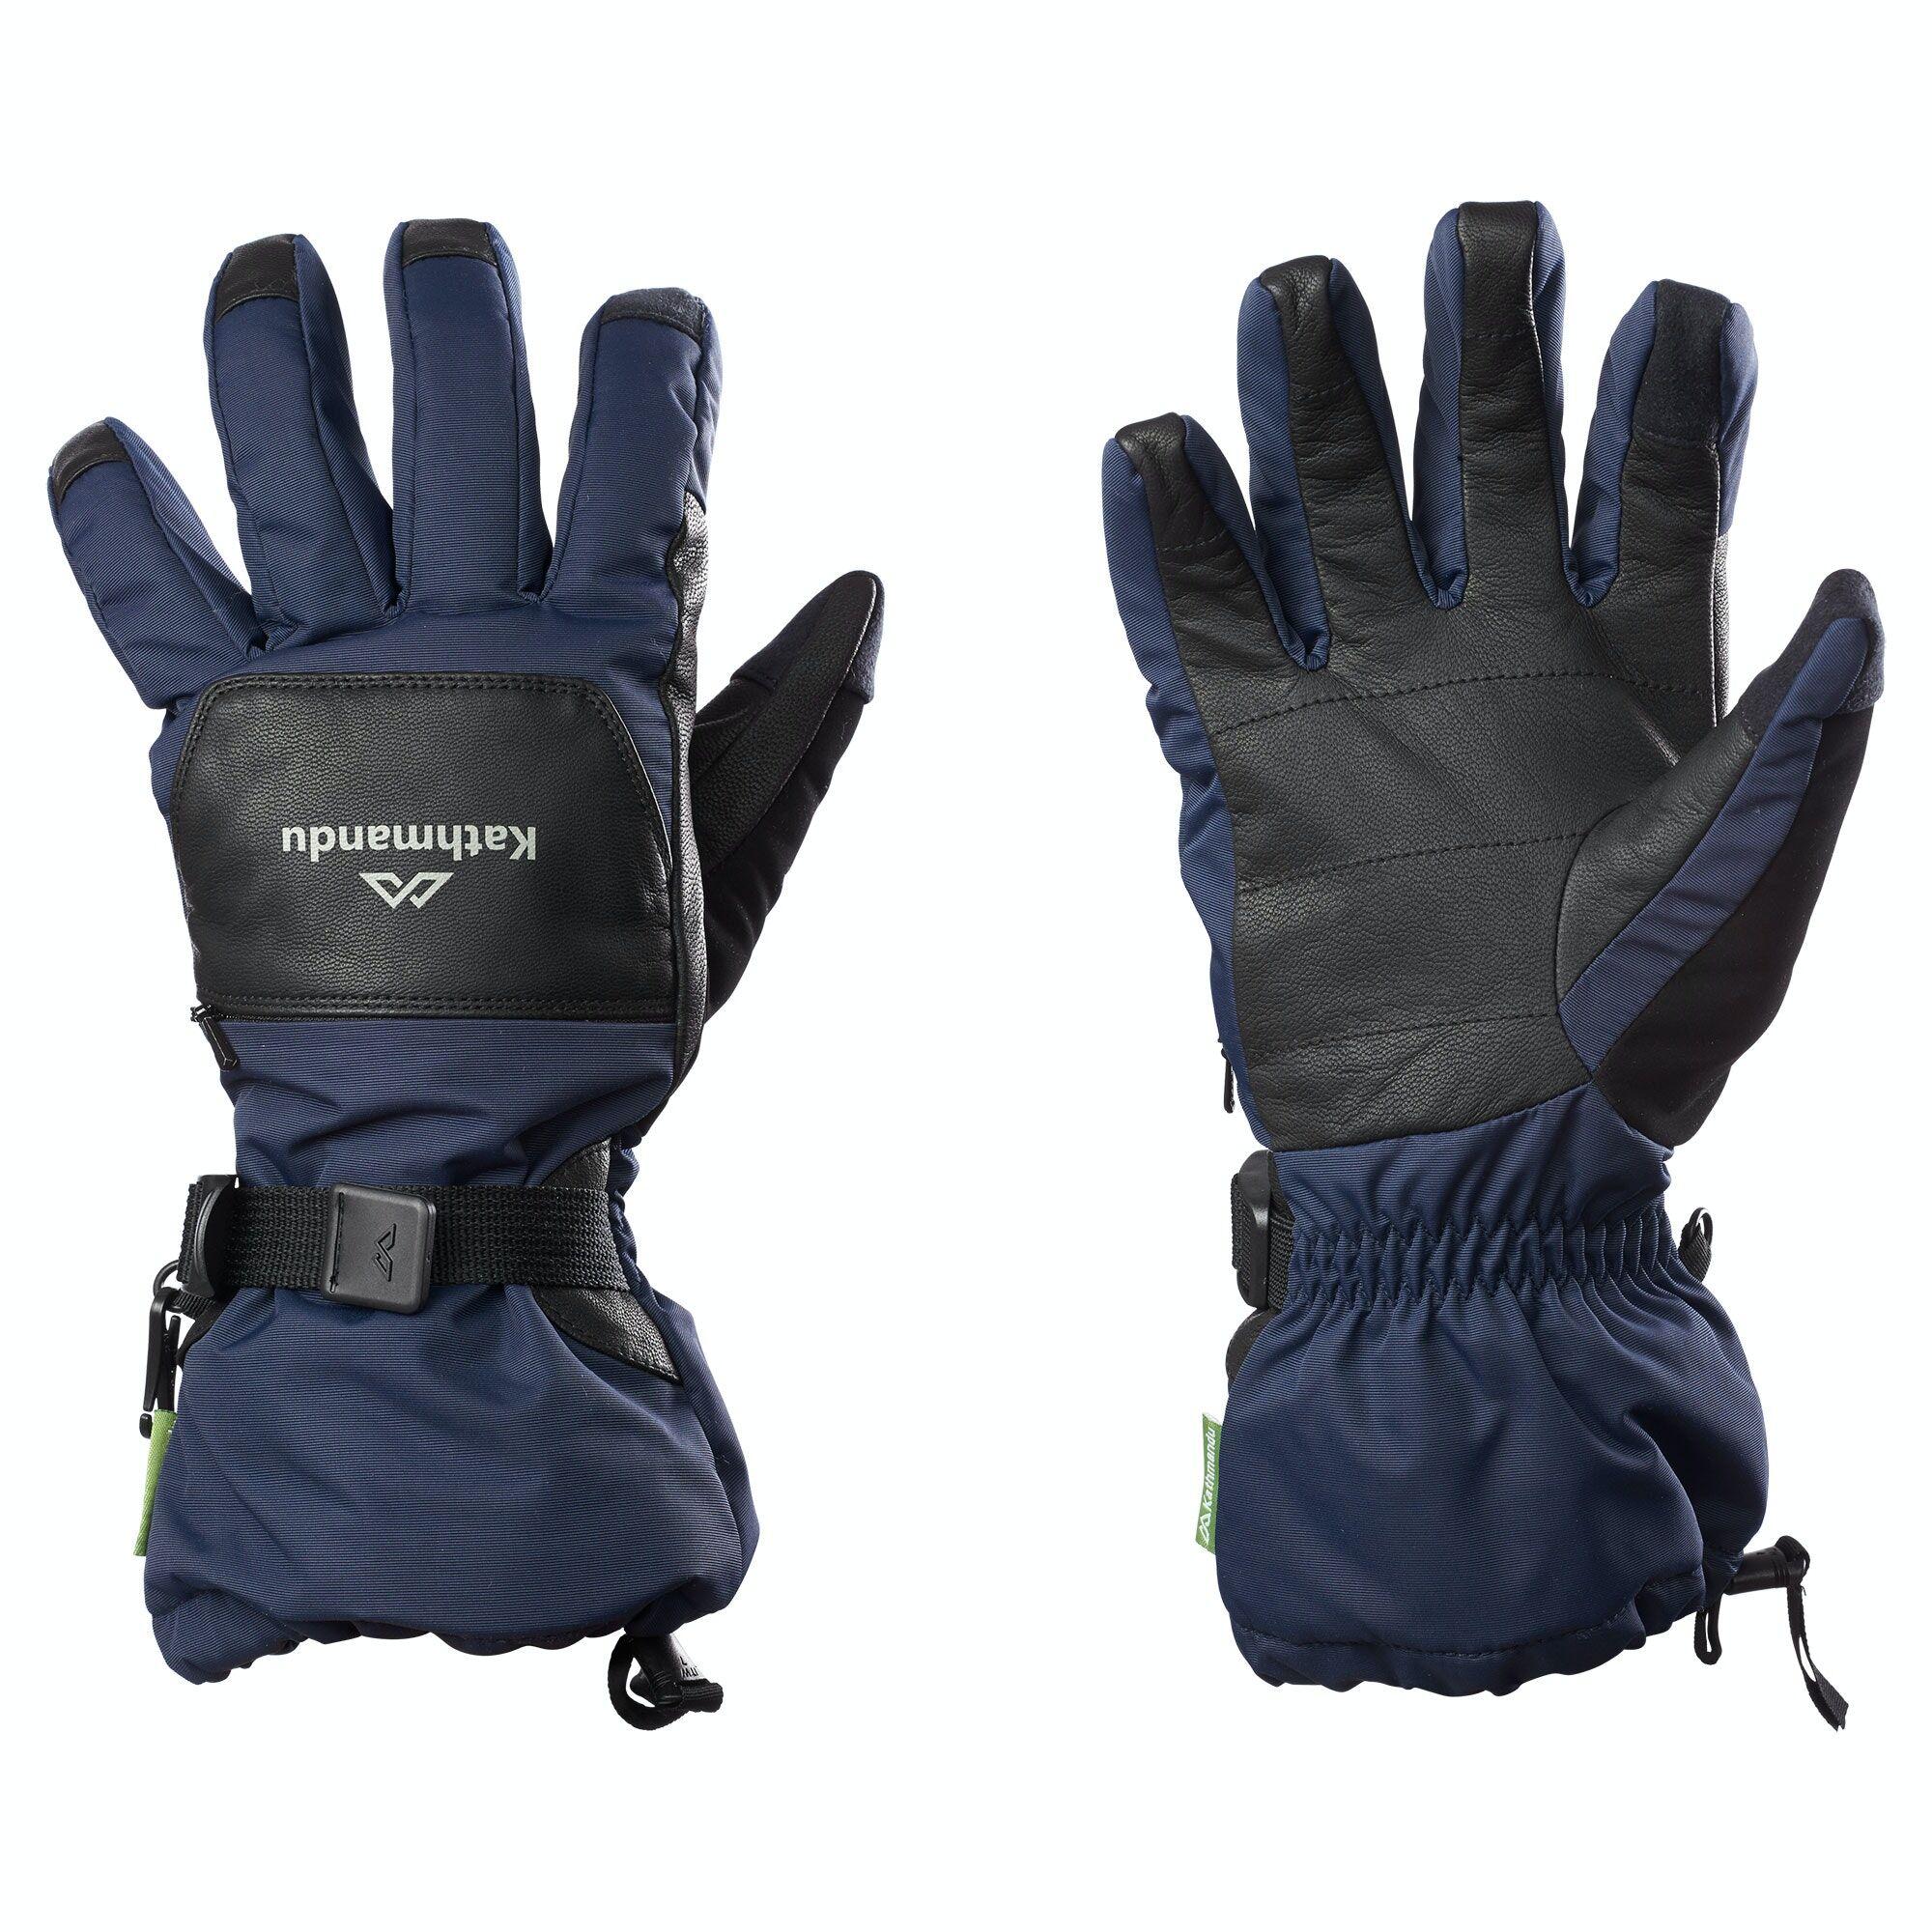 Kathmandu Snow Sports Gloves  - Dark Navy - Size: Small